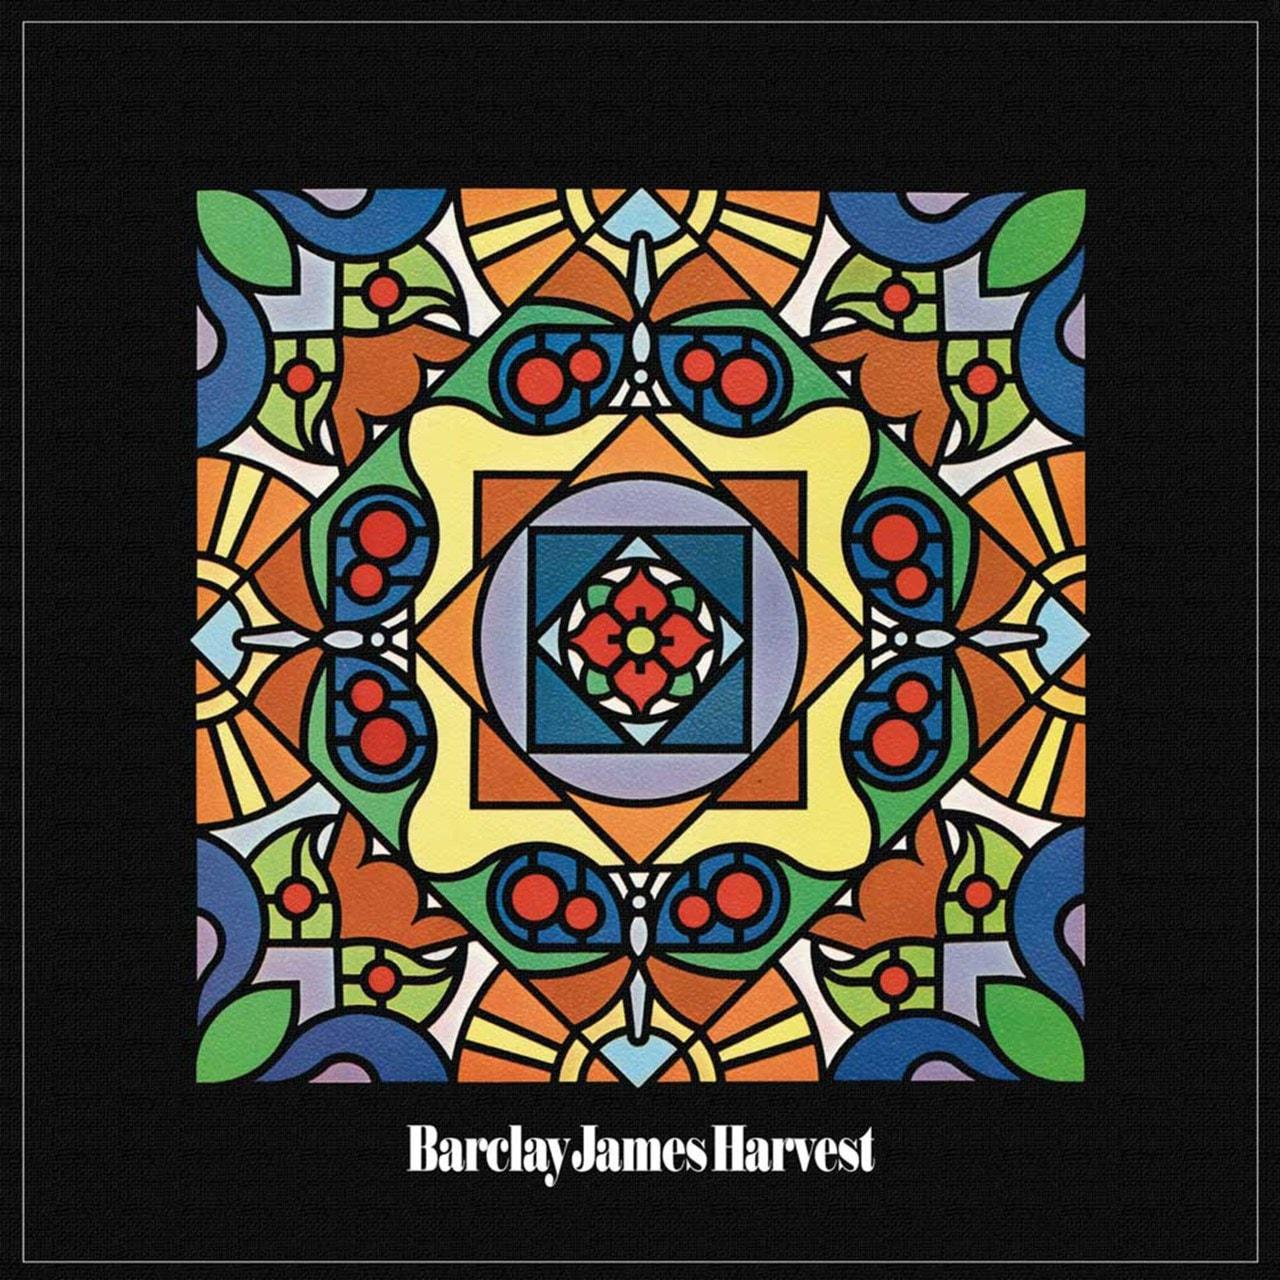 Barclay James Harvest - 1